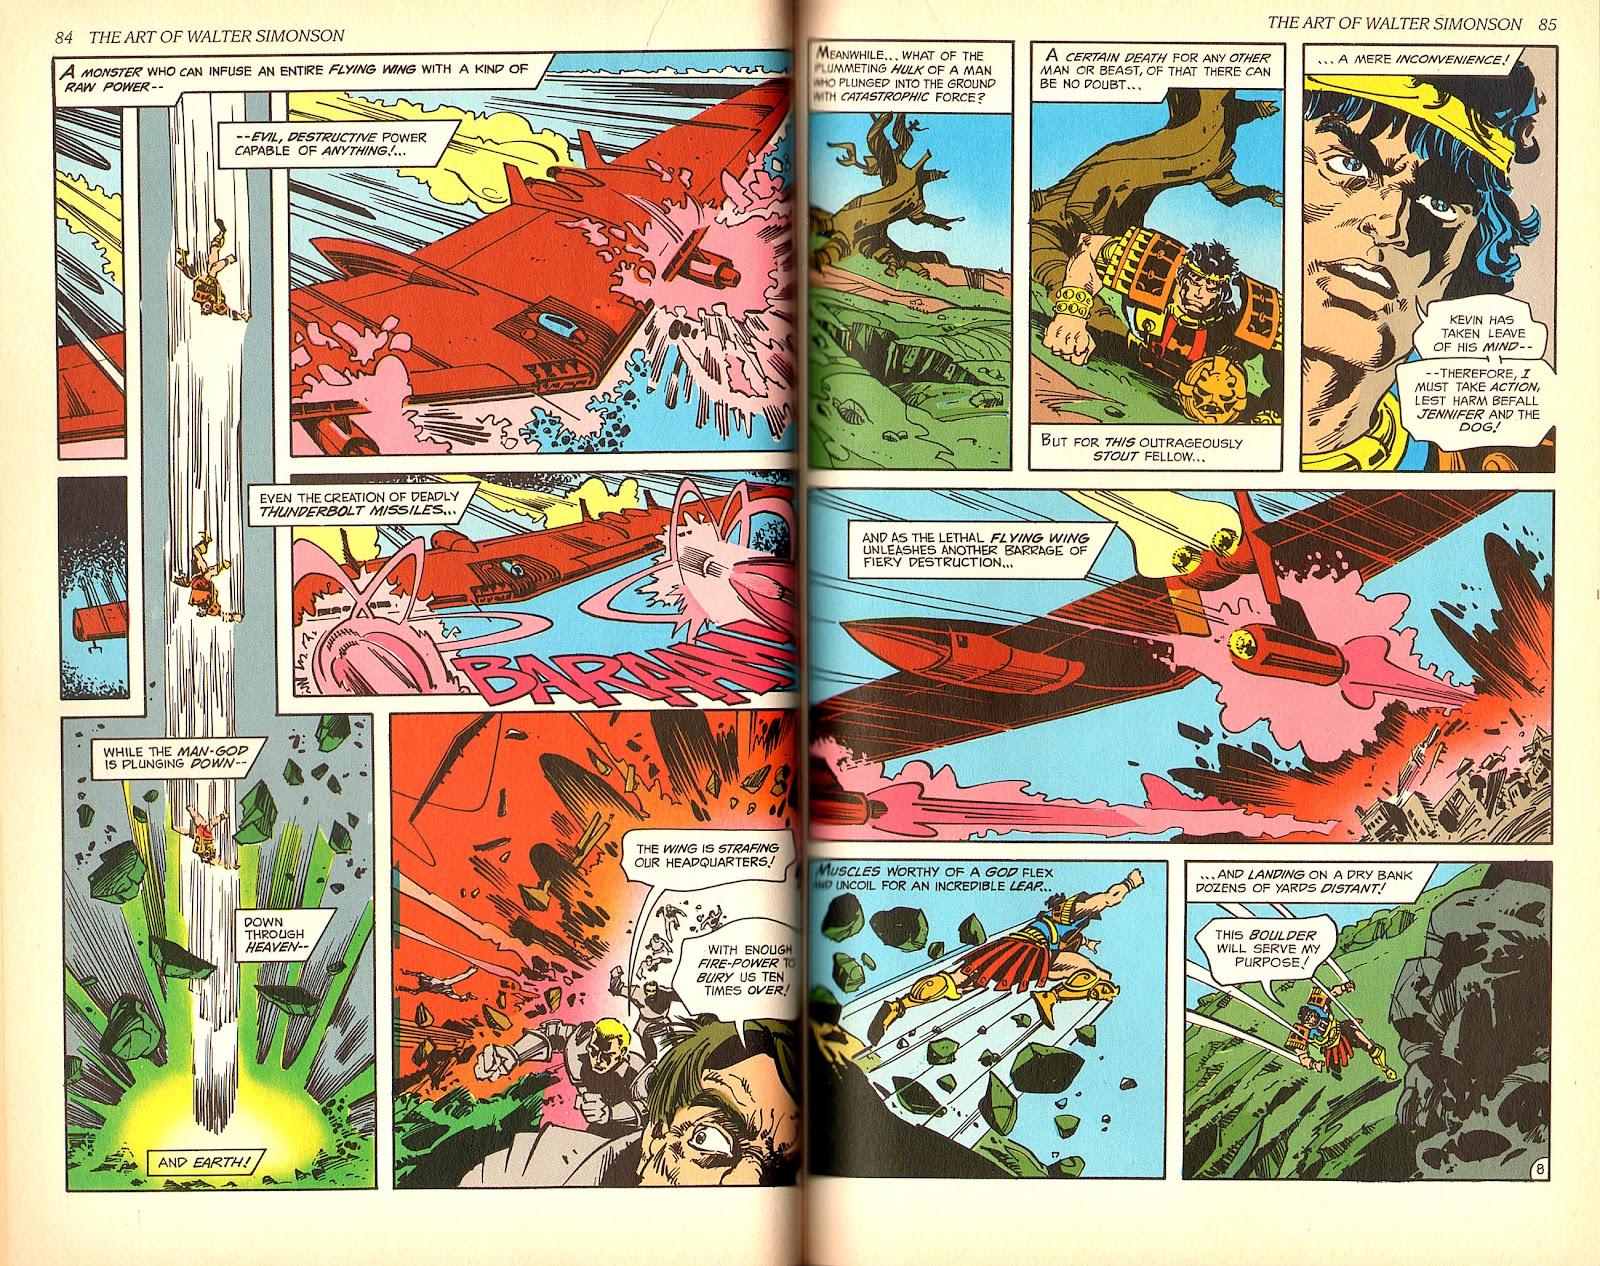 Read online The Art of Walter Simonson comic -  Issue # TPB - 44